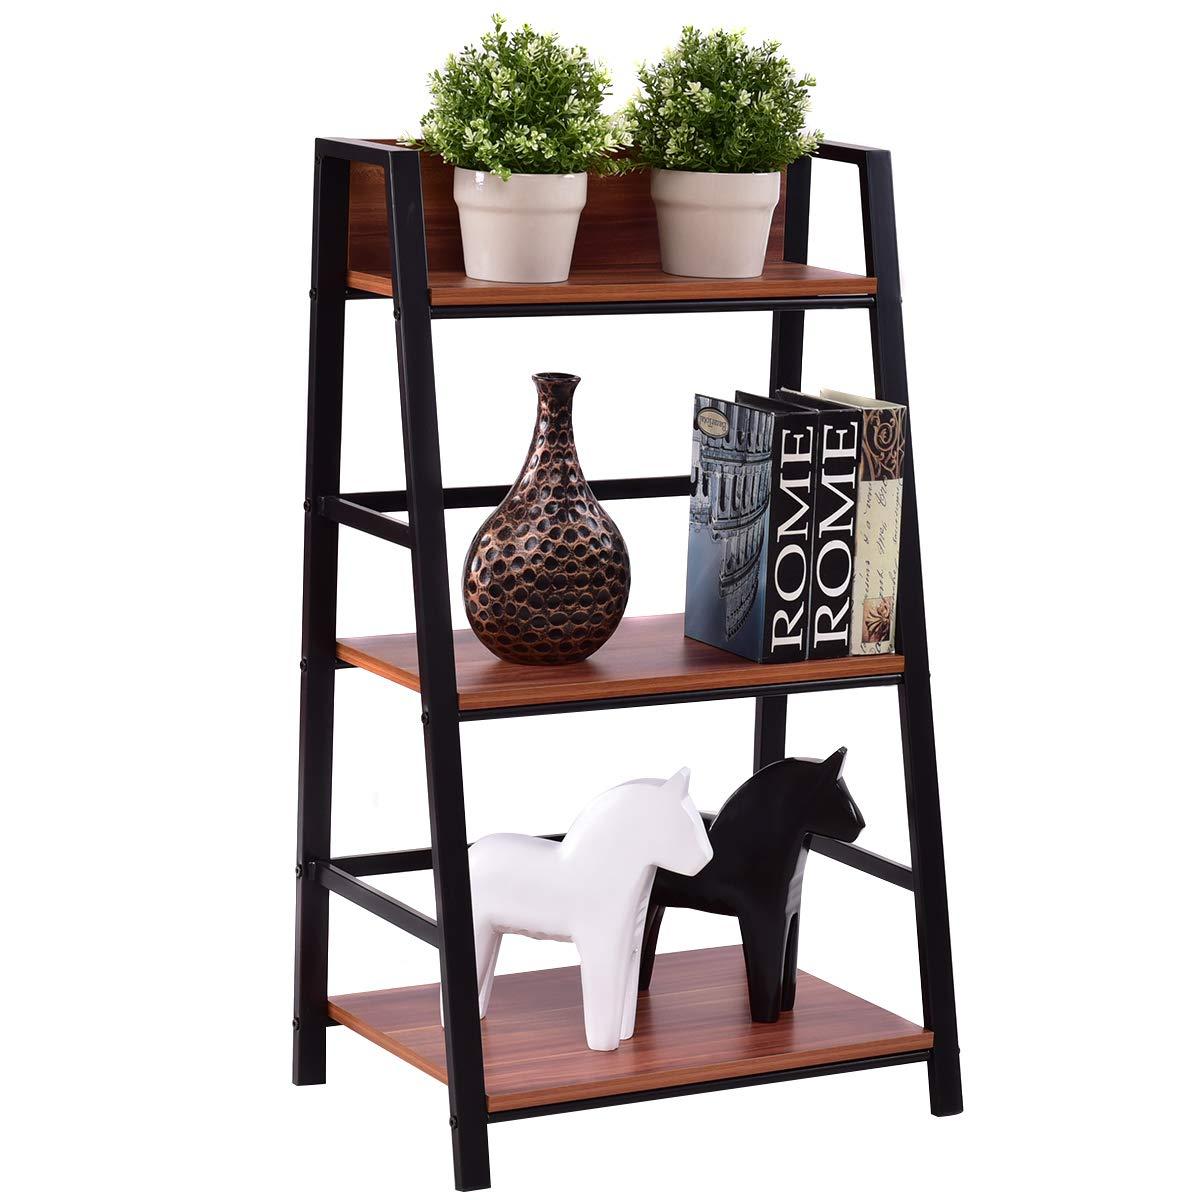 Tangkula 3-Tier Ladder Shelf Home Office Bookshelf Plant Display Stand Storage Shelves Multipurpose Corner Shelf Bookcase